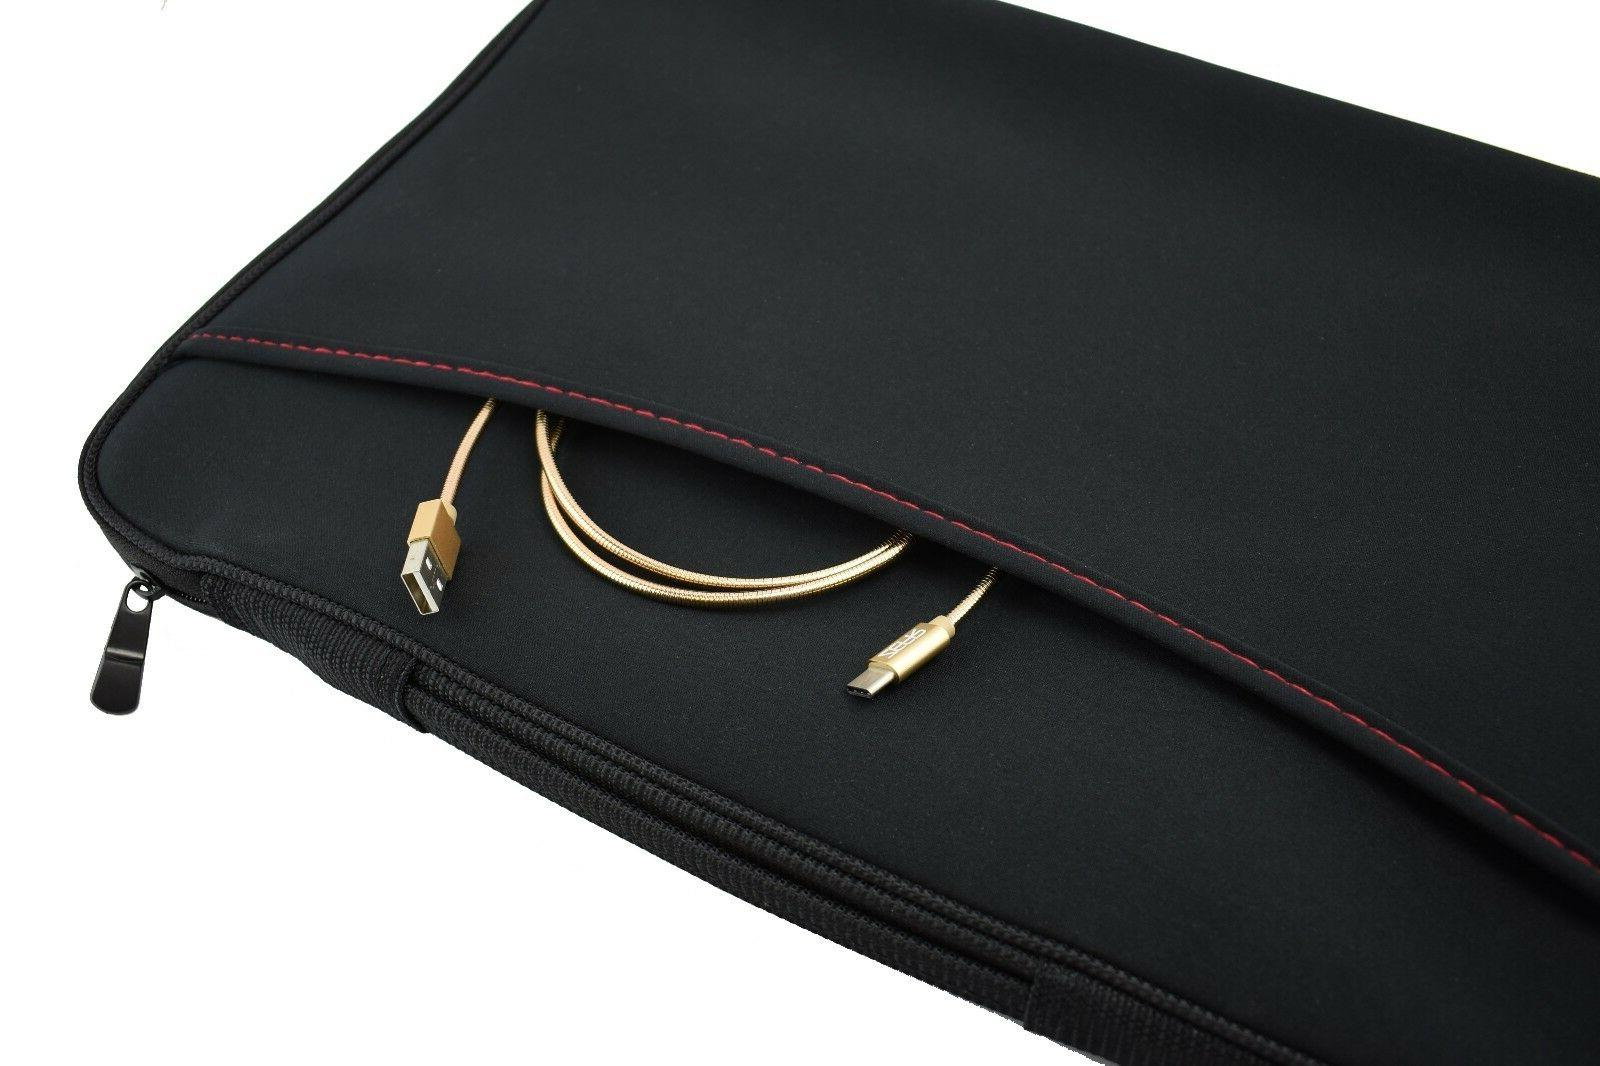 Logitech Portable Laptop Notebook Sleeve For